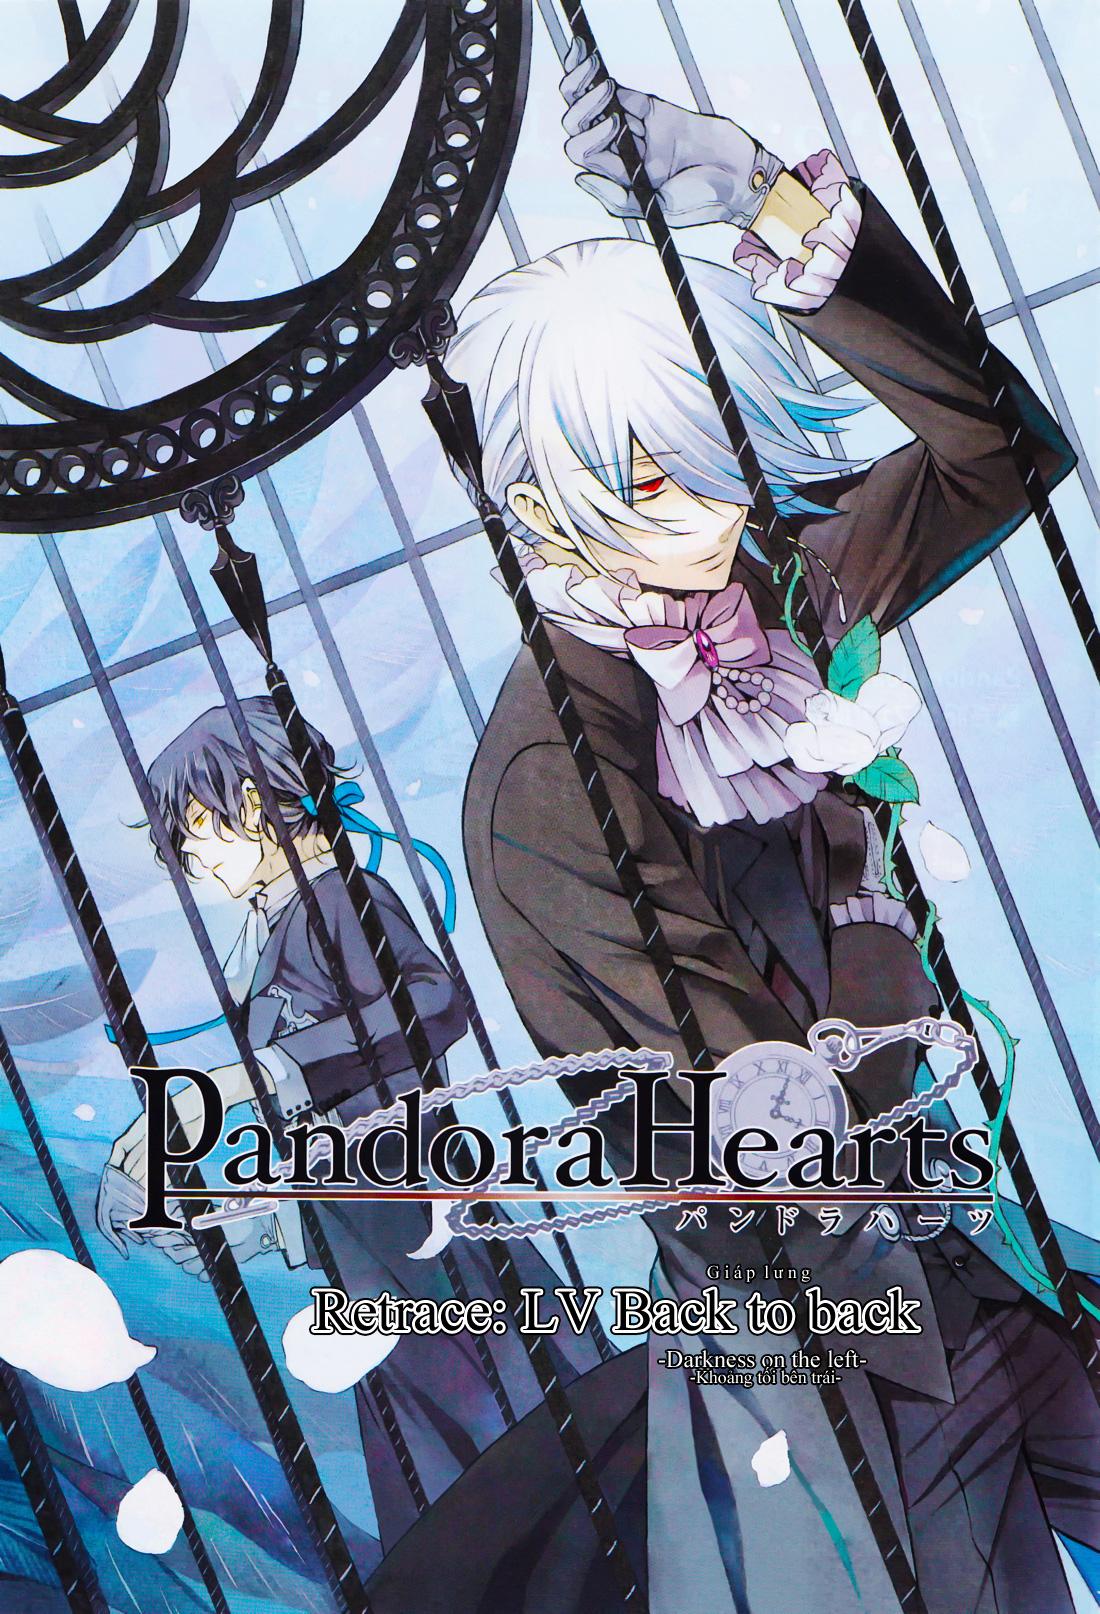 Pandora Hearts chương 055 - retrace: lv back to back trang 1